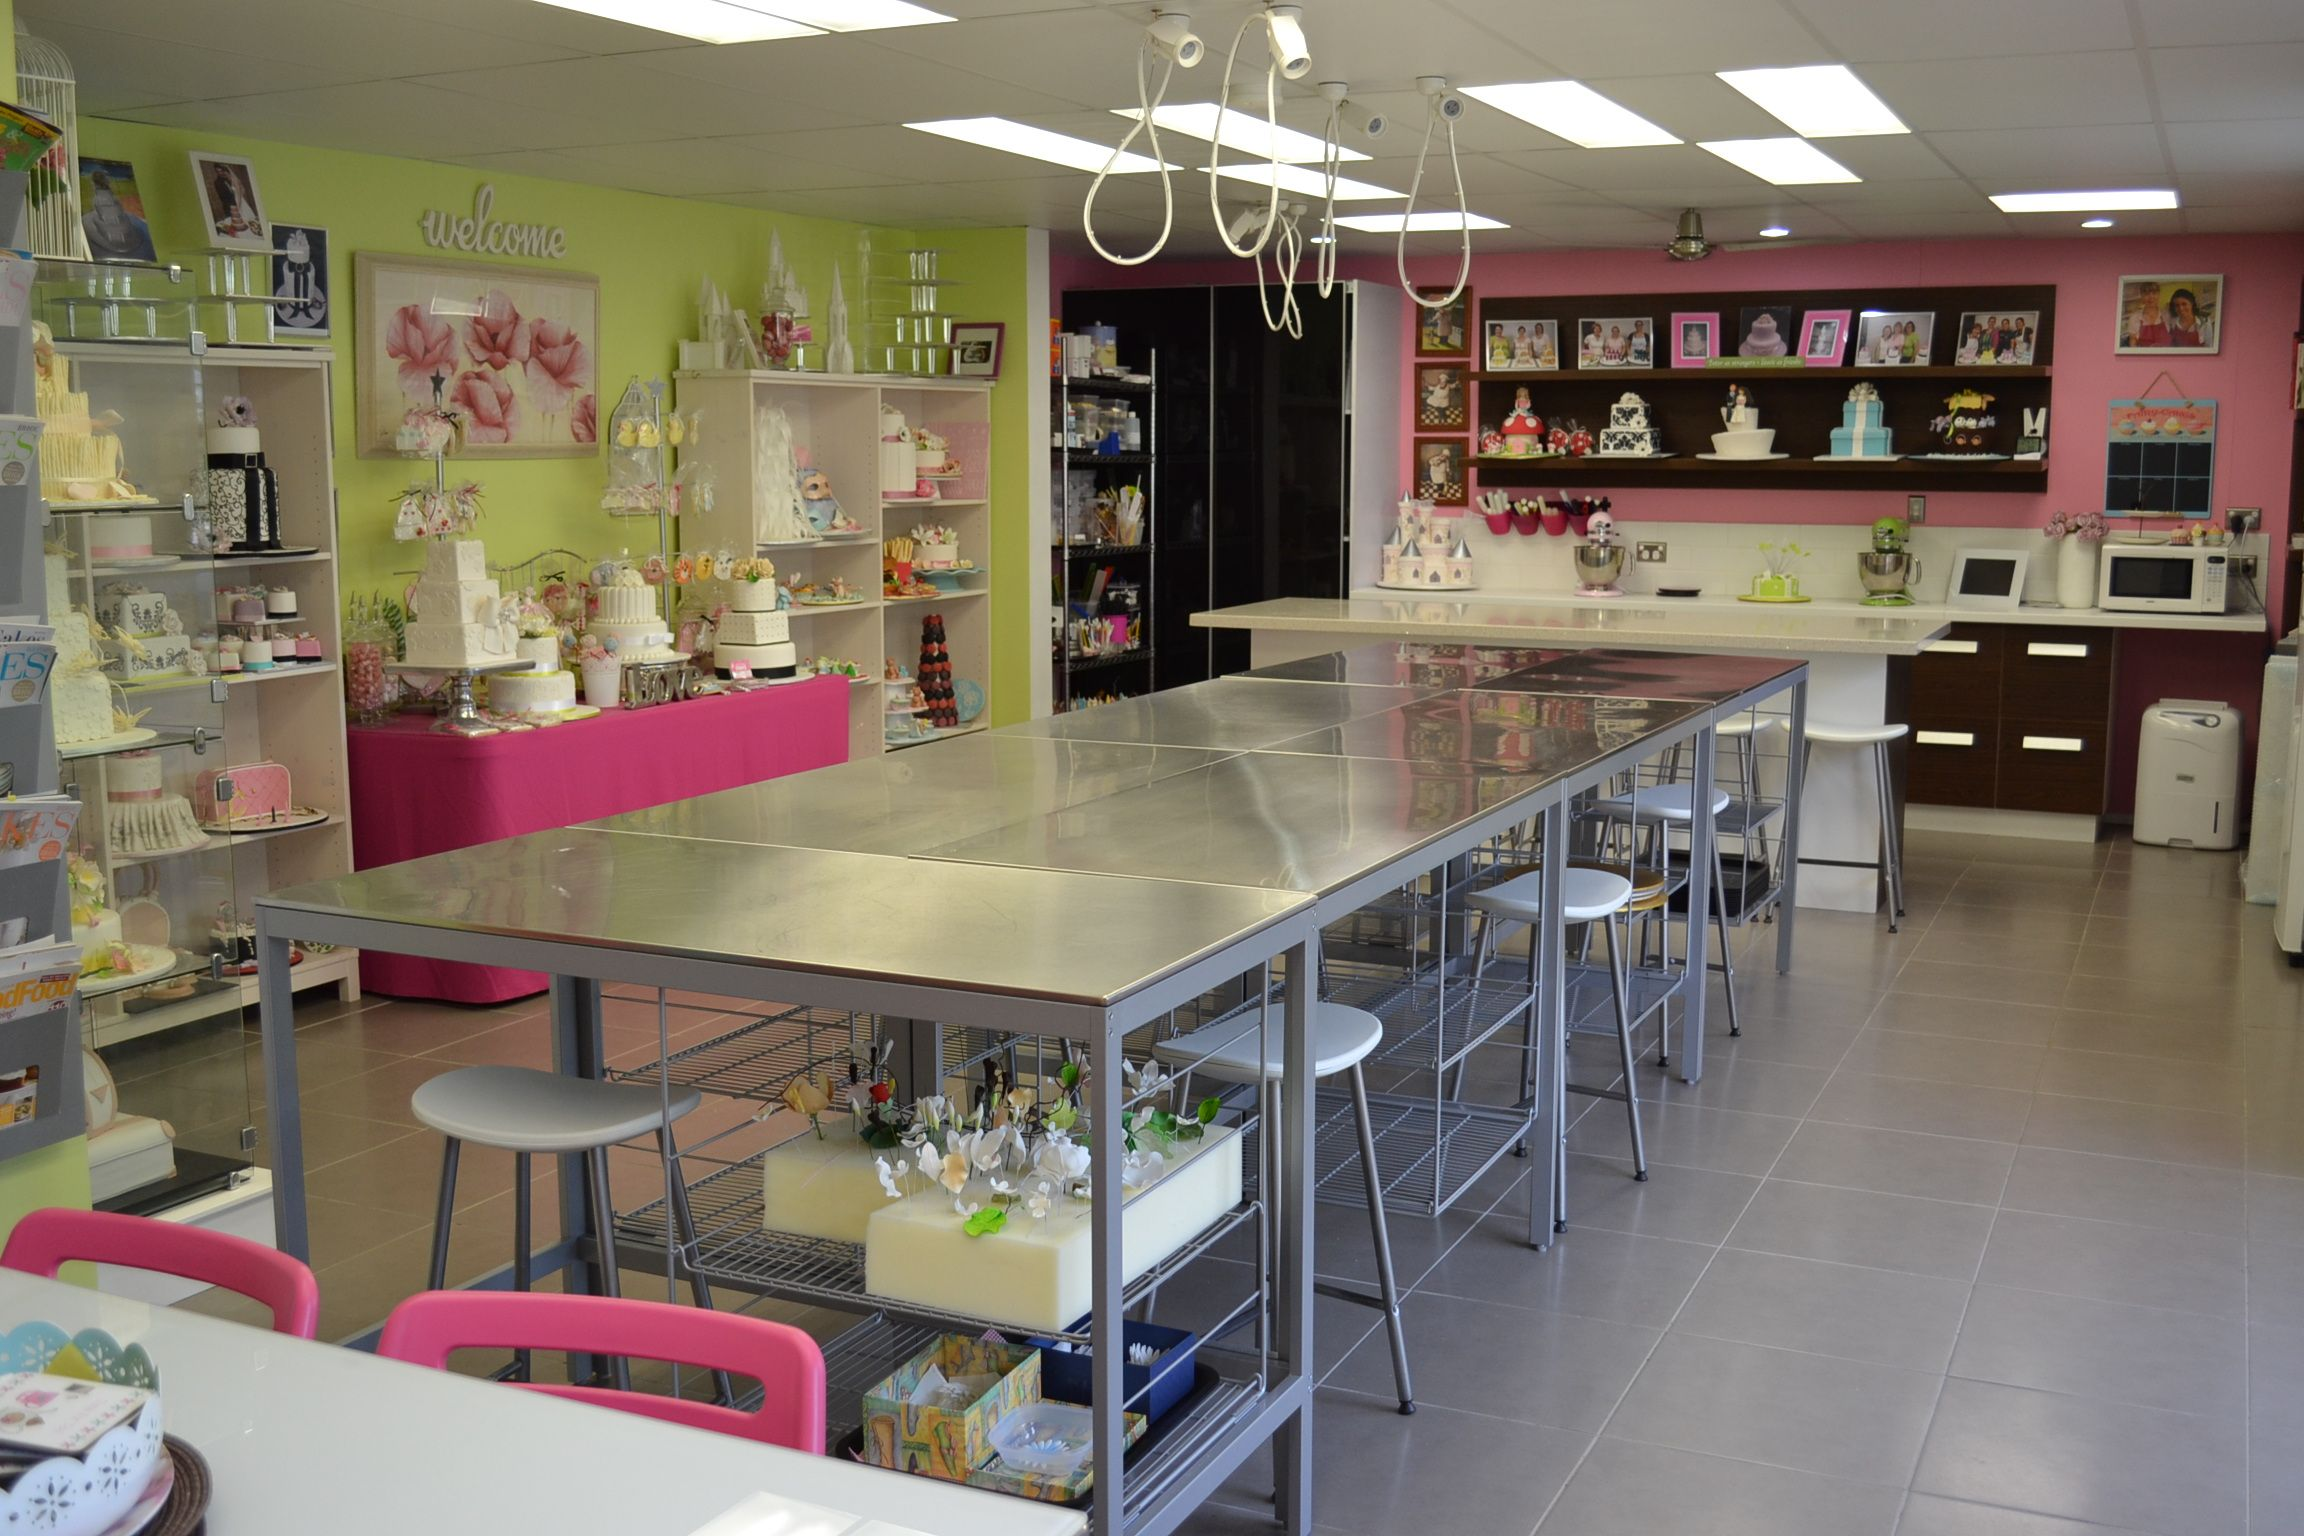 DSC_0140.JPG (2304×1536)   Bakery kitchen, Kitchen decor ...